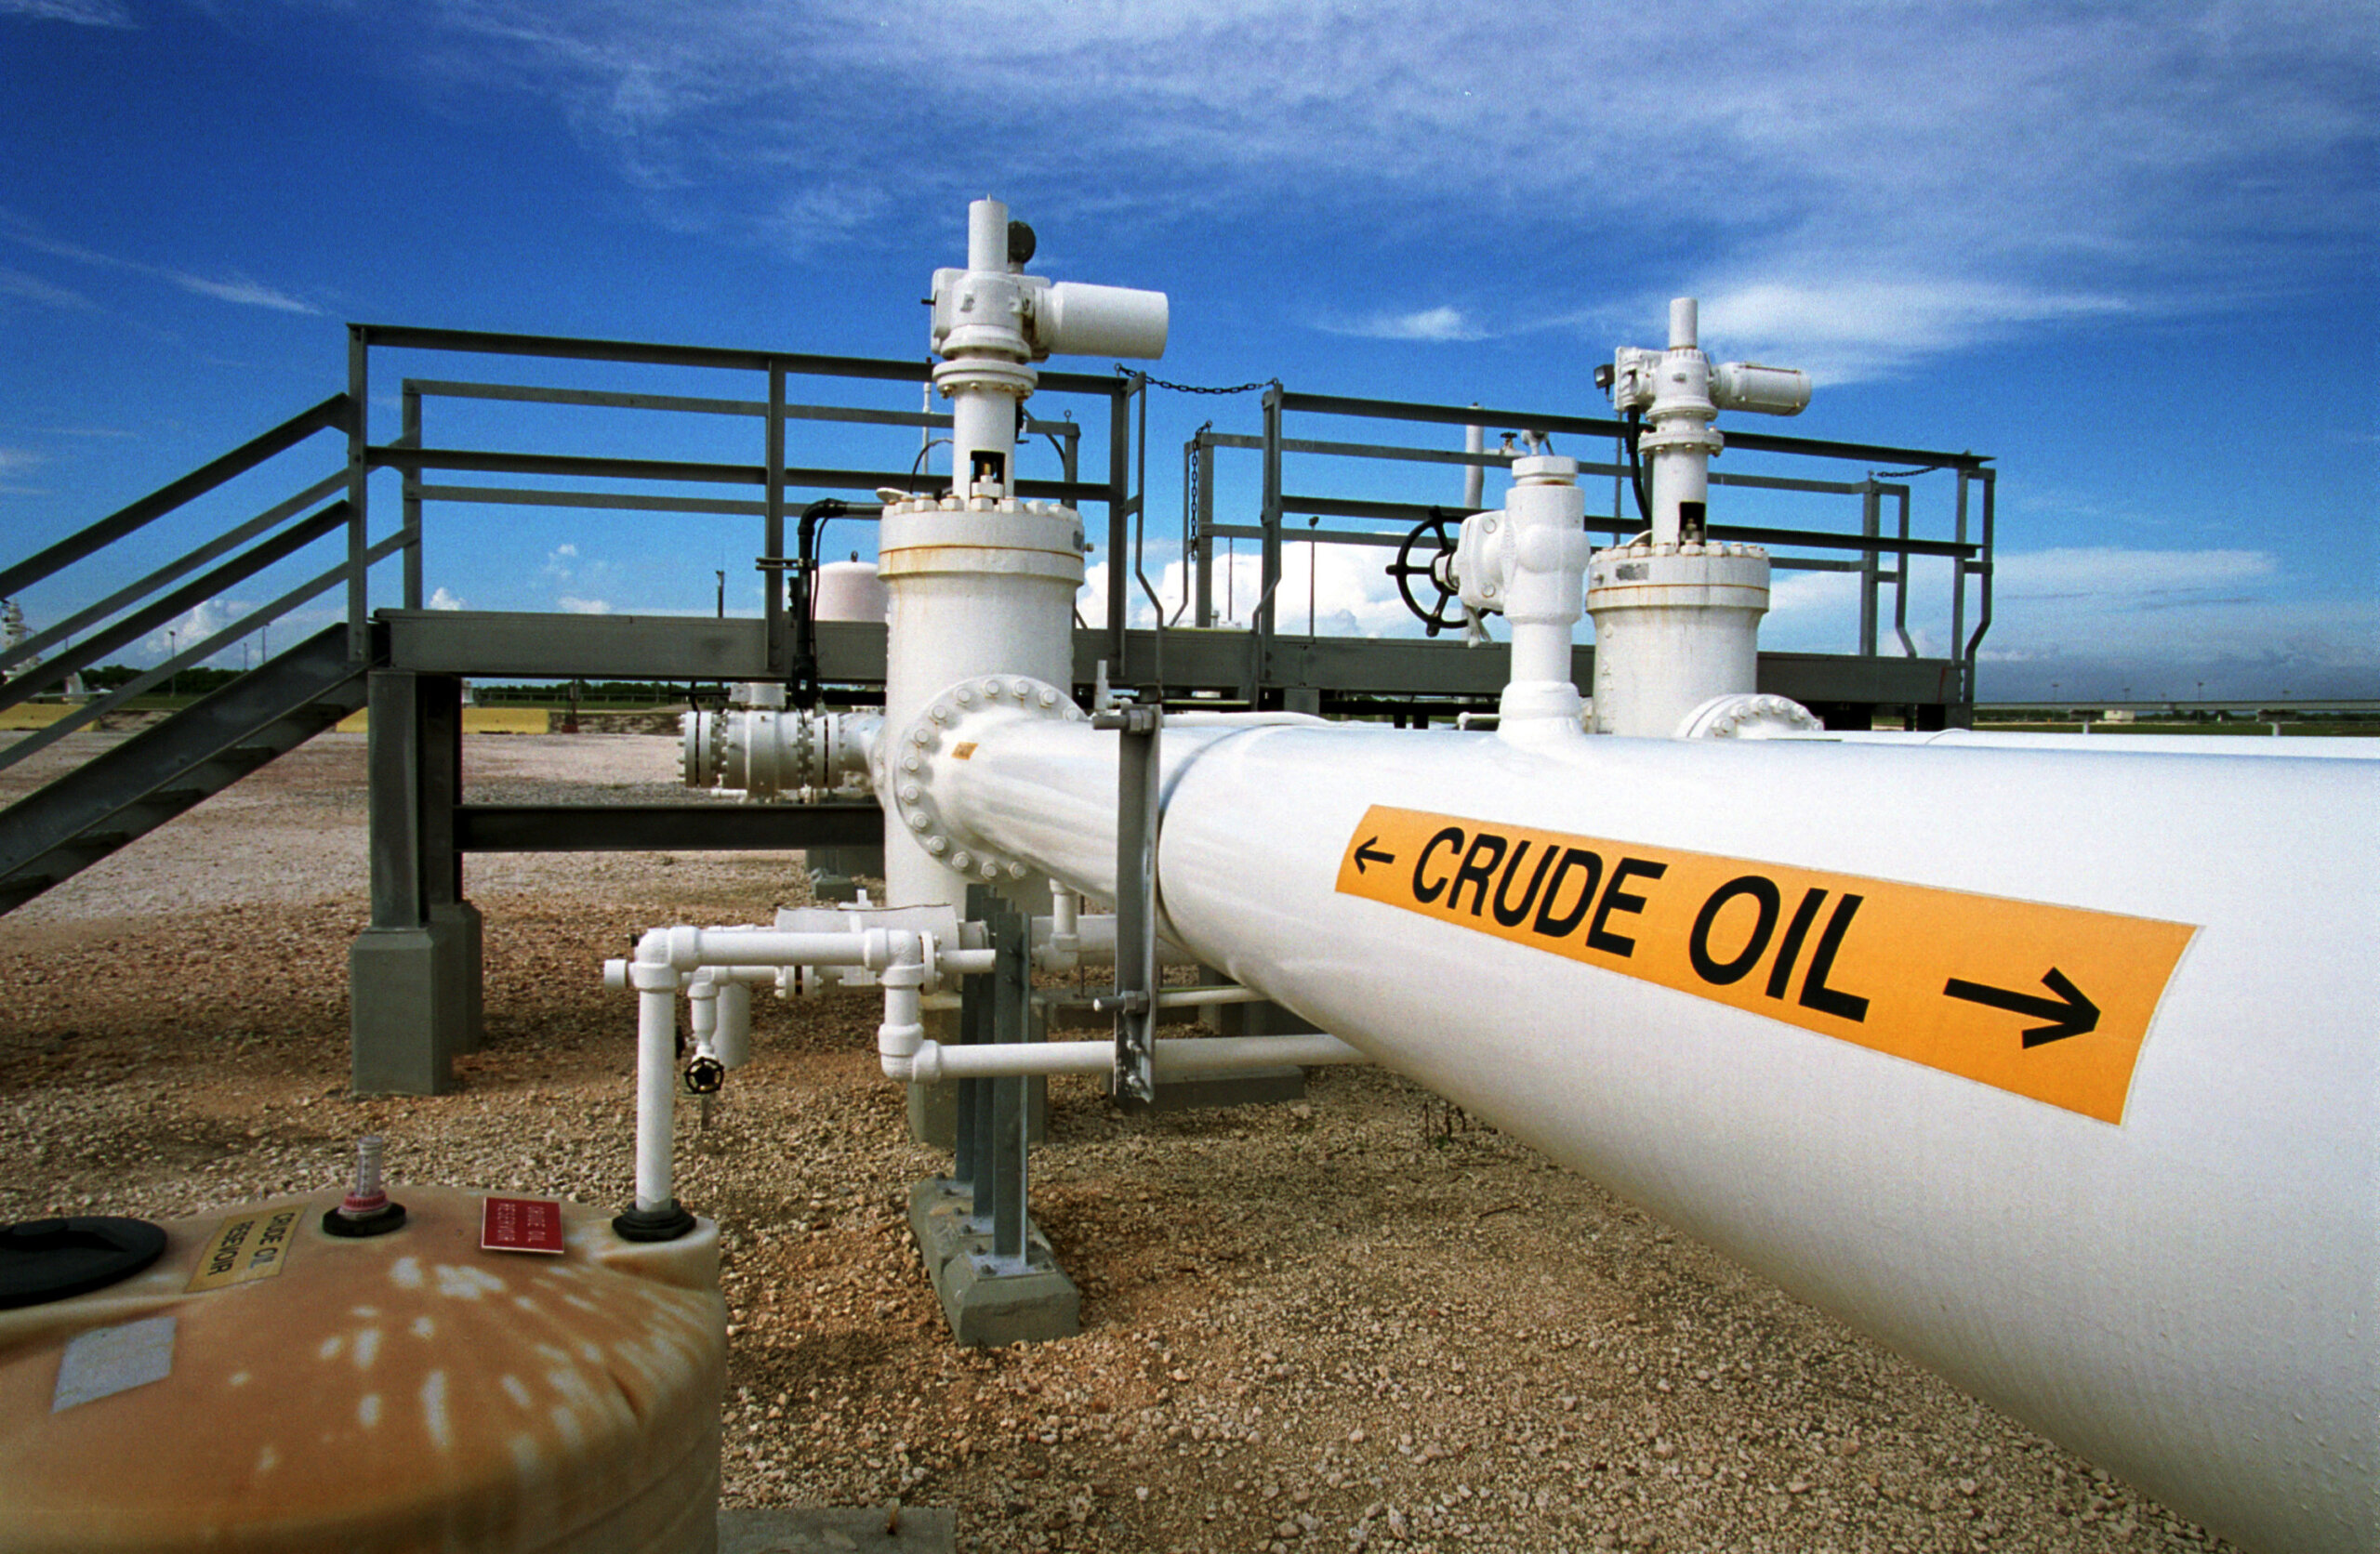 A crude oil pipeline at the Federal Strategic Petroleum Reserve facility